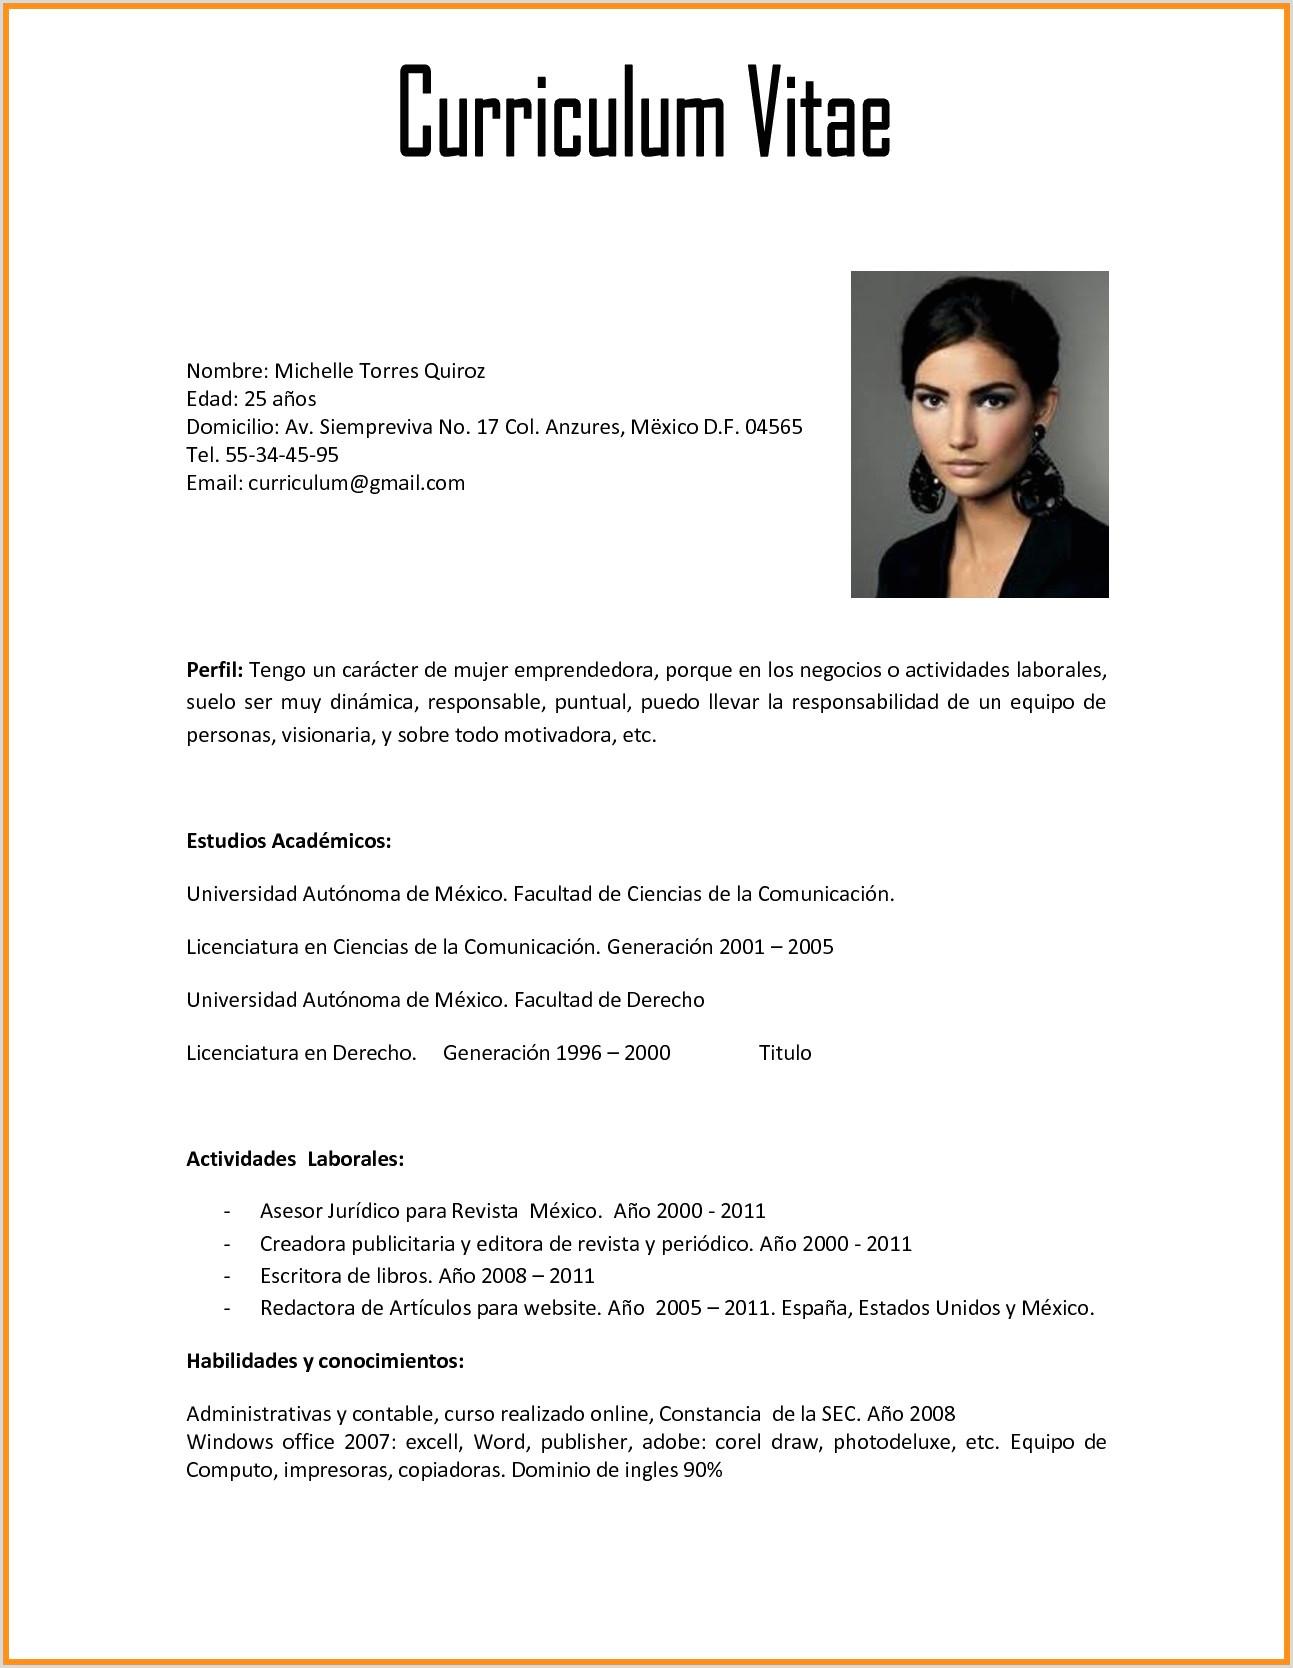 Curriculum Vitae formato Word Para Rellenar Gratis Sin Experiencia Laboral Plantillas Para Cv Simple ¢Ë†Å¡ Curriculum Actor Plantilla